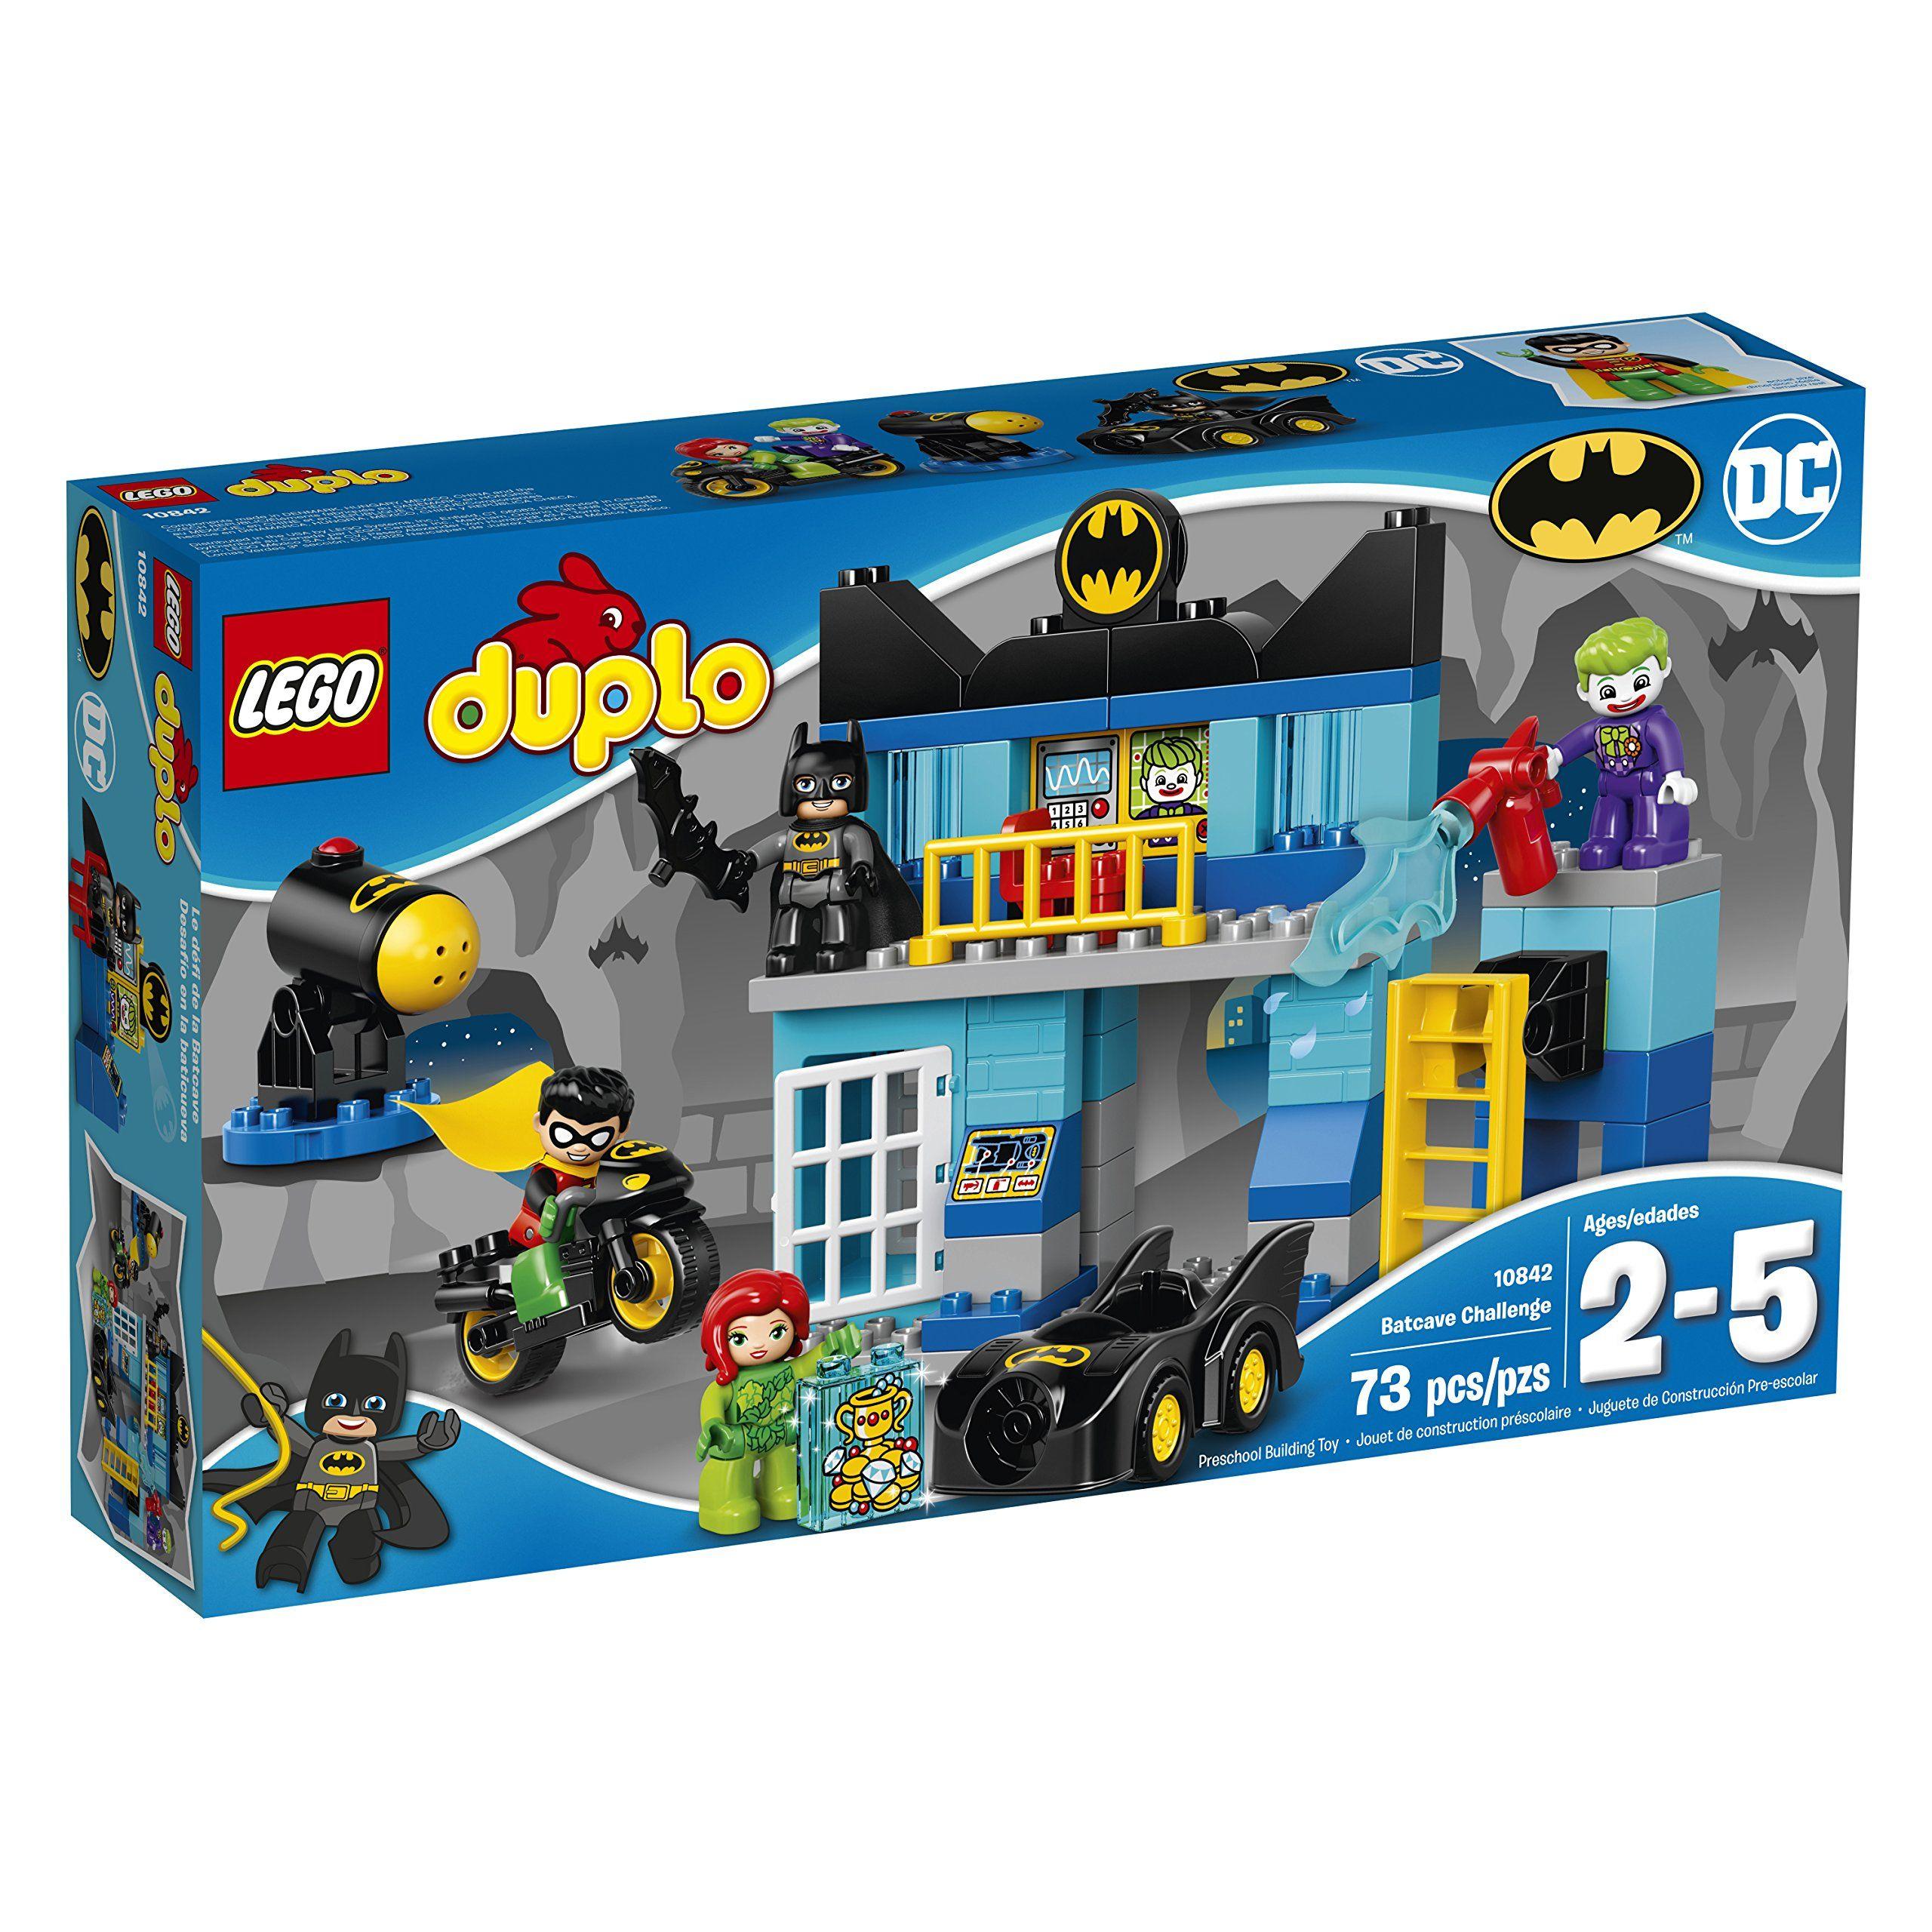 LEGO DUPLO DC ics Super Heroes Batman Batcave Challenge